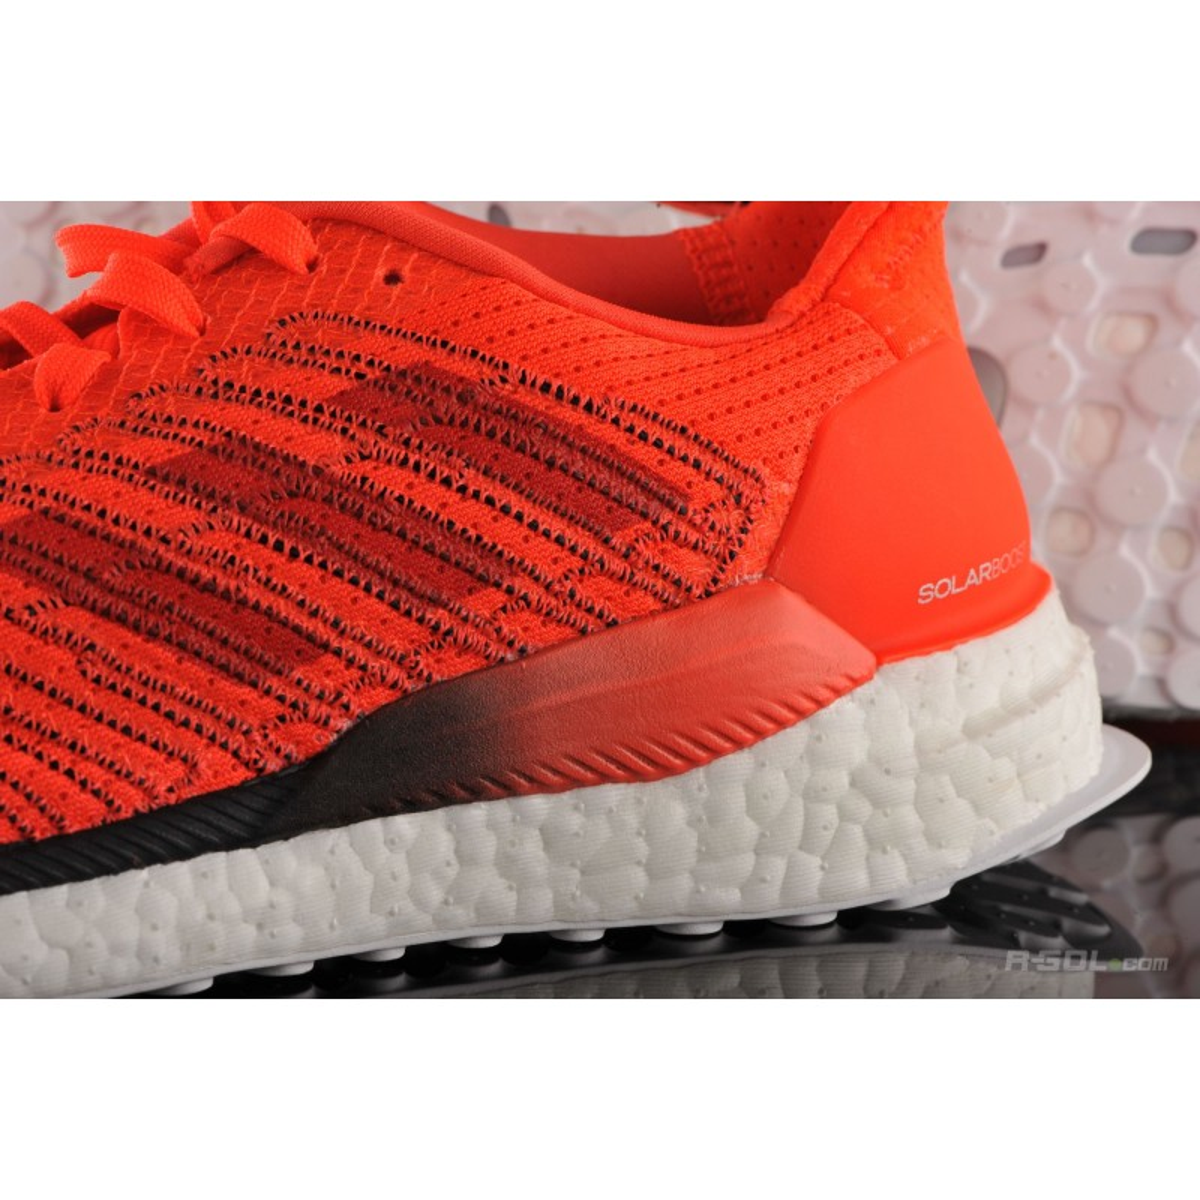 Puntero Un fiel Discutir  Adidas Solar Boost 19 Men's Running Shoes Orange AW19